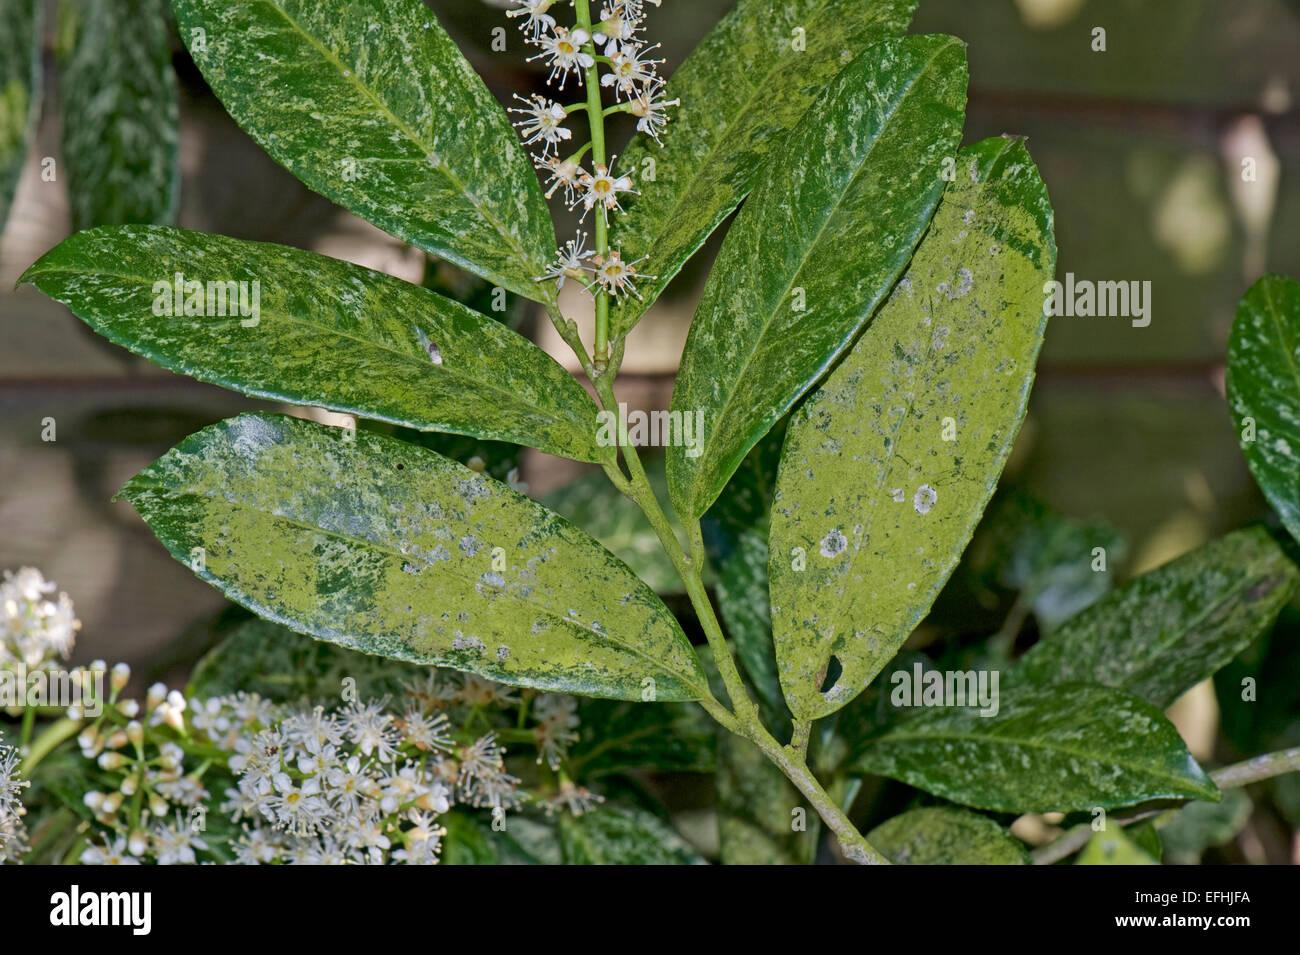 Algae forming a green covering of this perennial shrub, laurel, Prunus nobilis, in flower, Berkshire, April - Stock Image